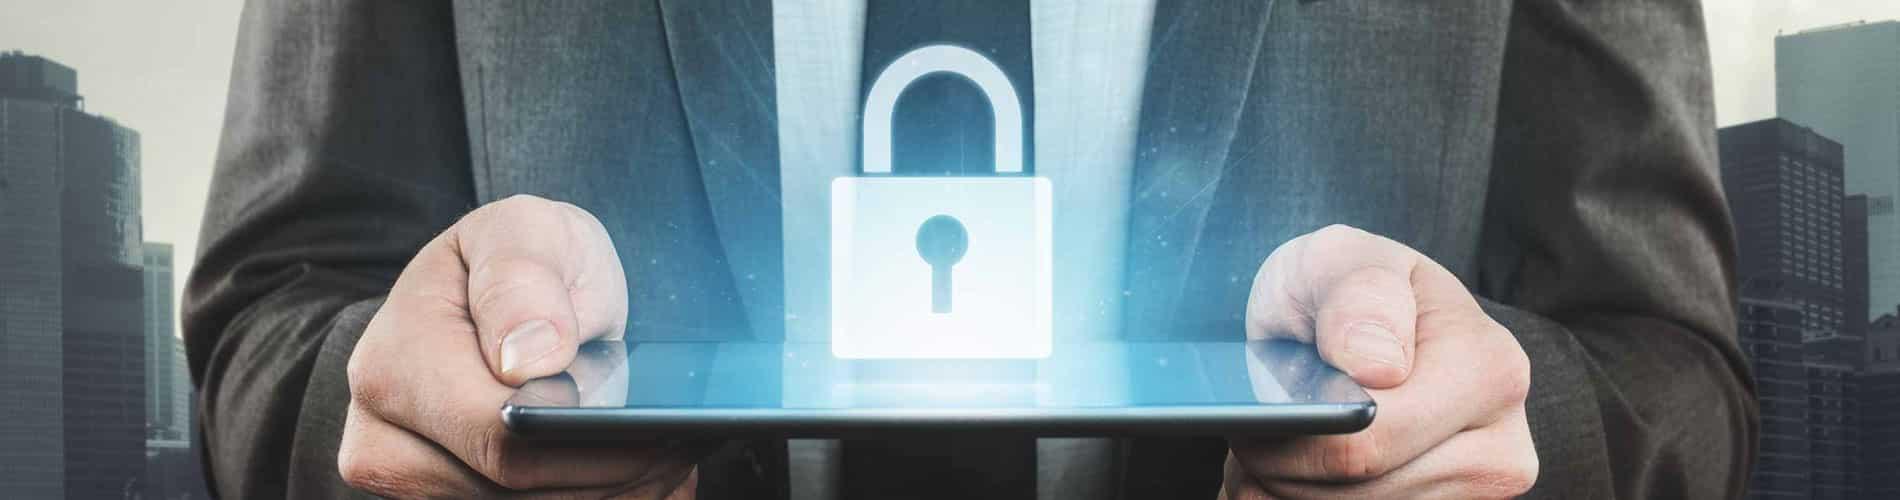 The Vortex - Cybersecrity